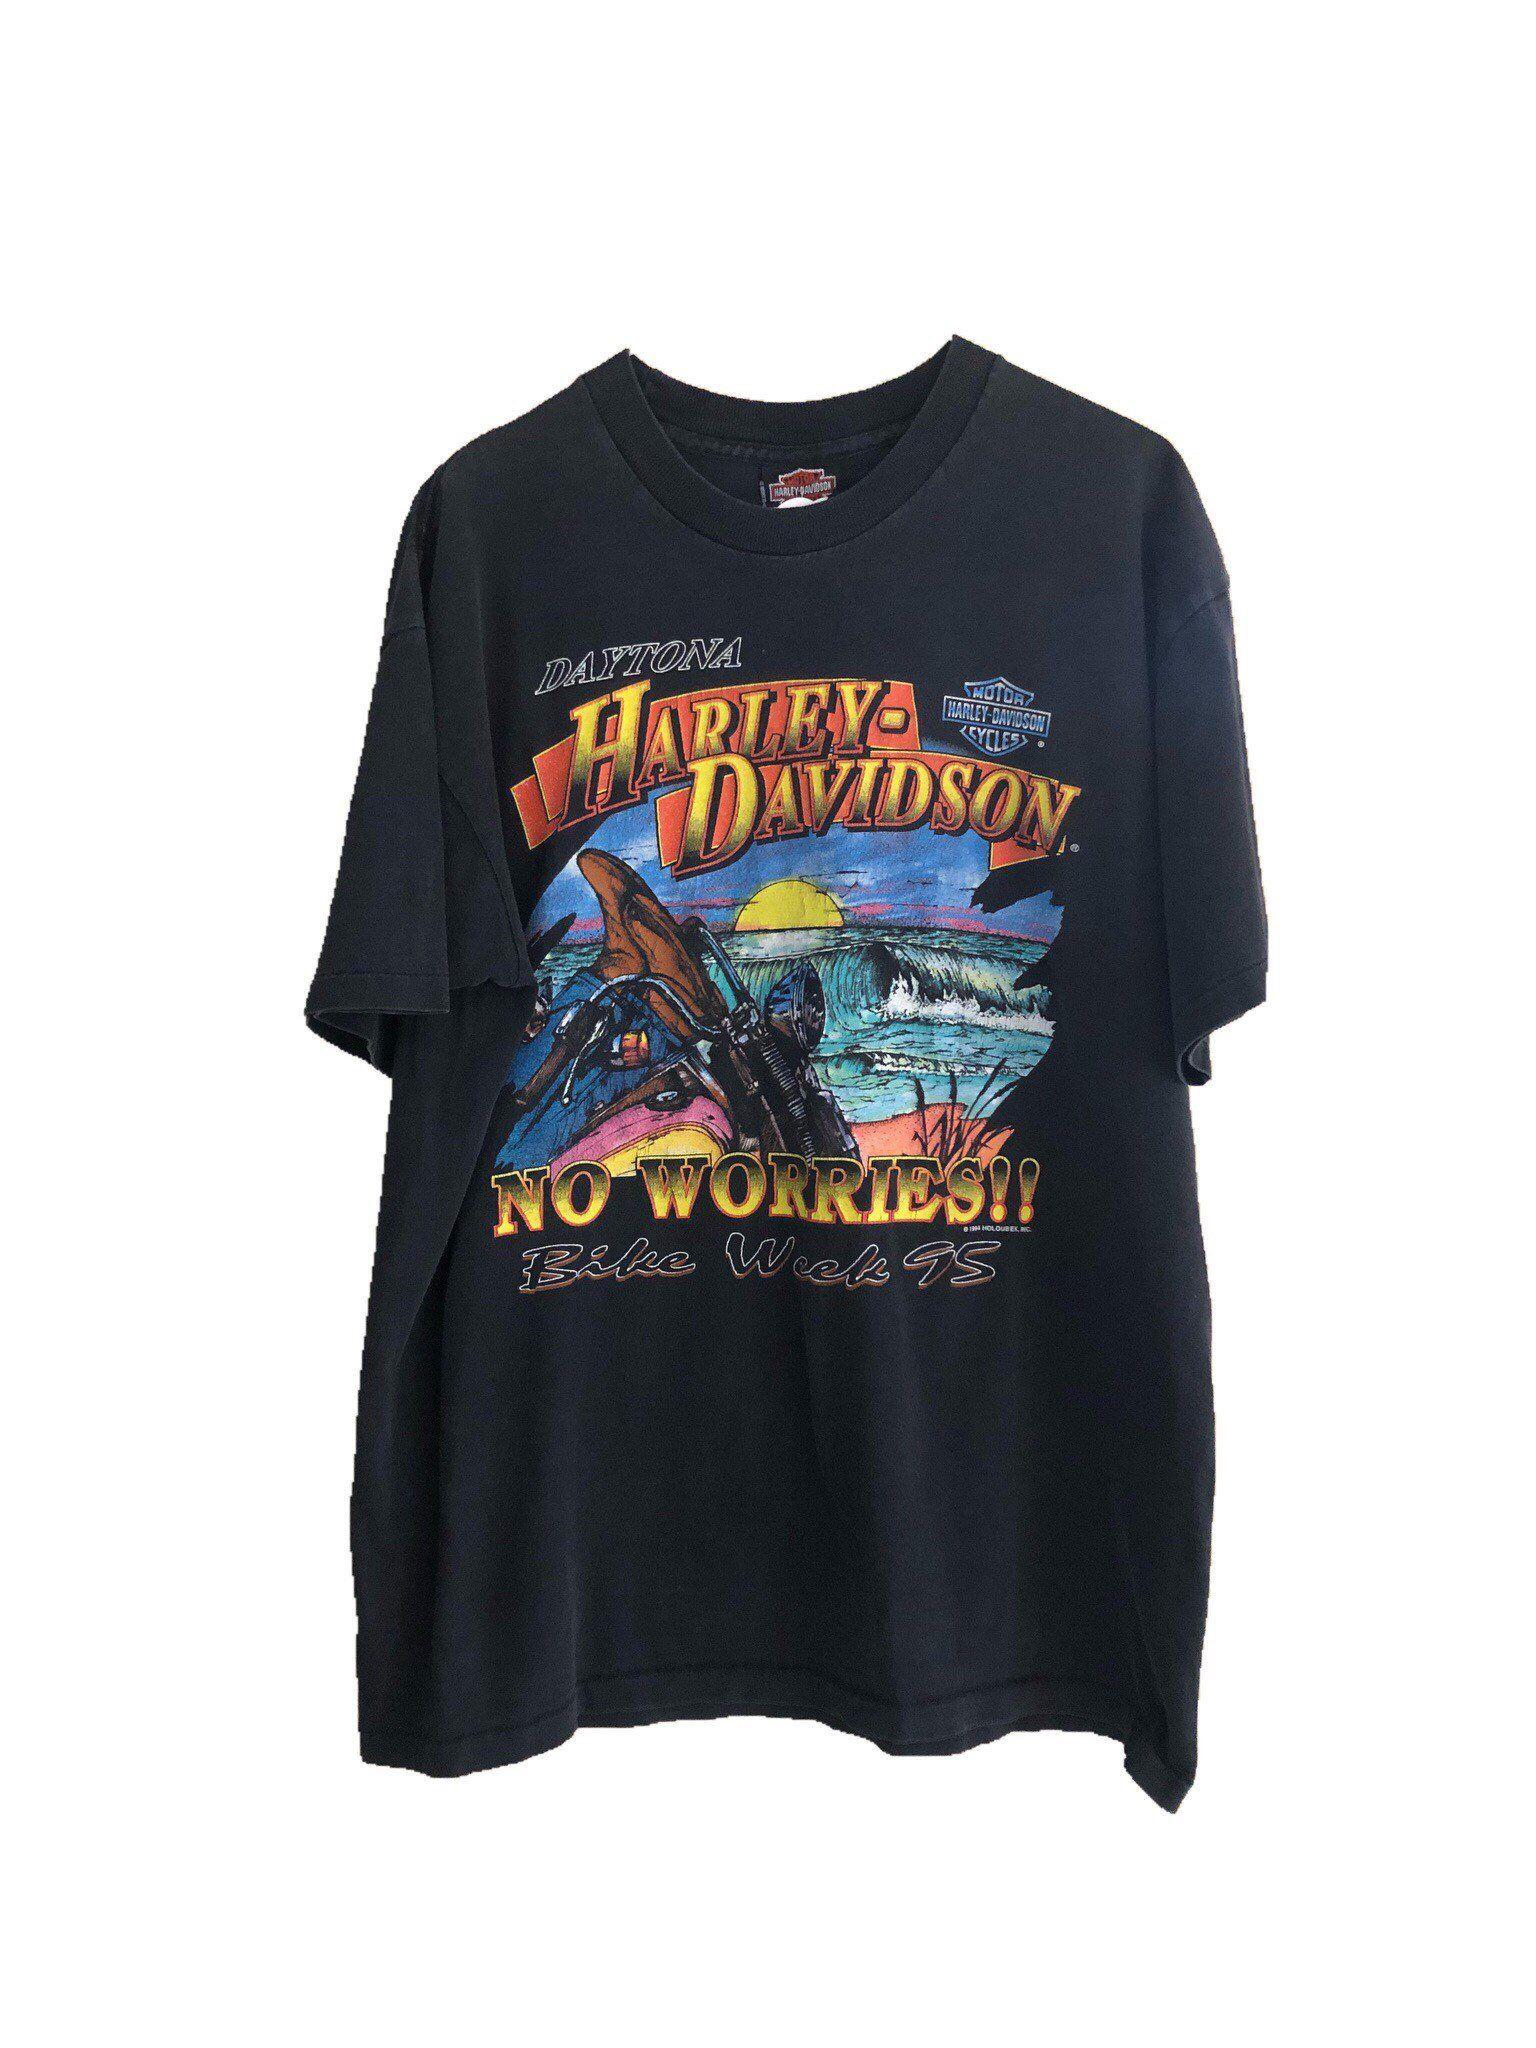 Vtg 94 Harley Davidson 3d Shirt Bike Week 95 Mens Women Etsy Rad Shirts Vintage Outfits 3d Shirt